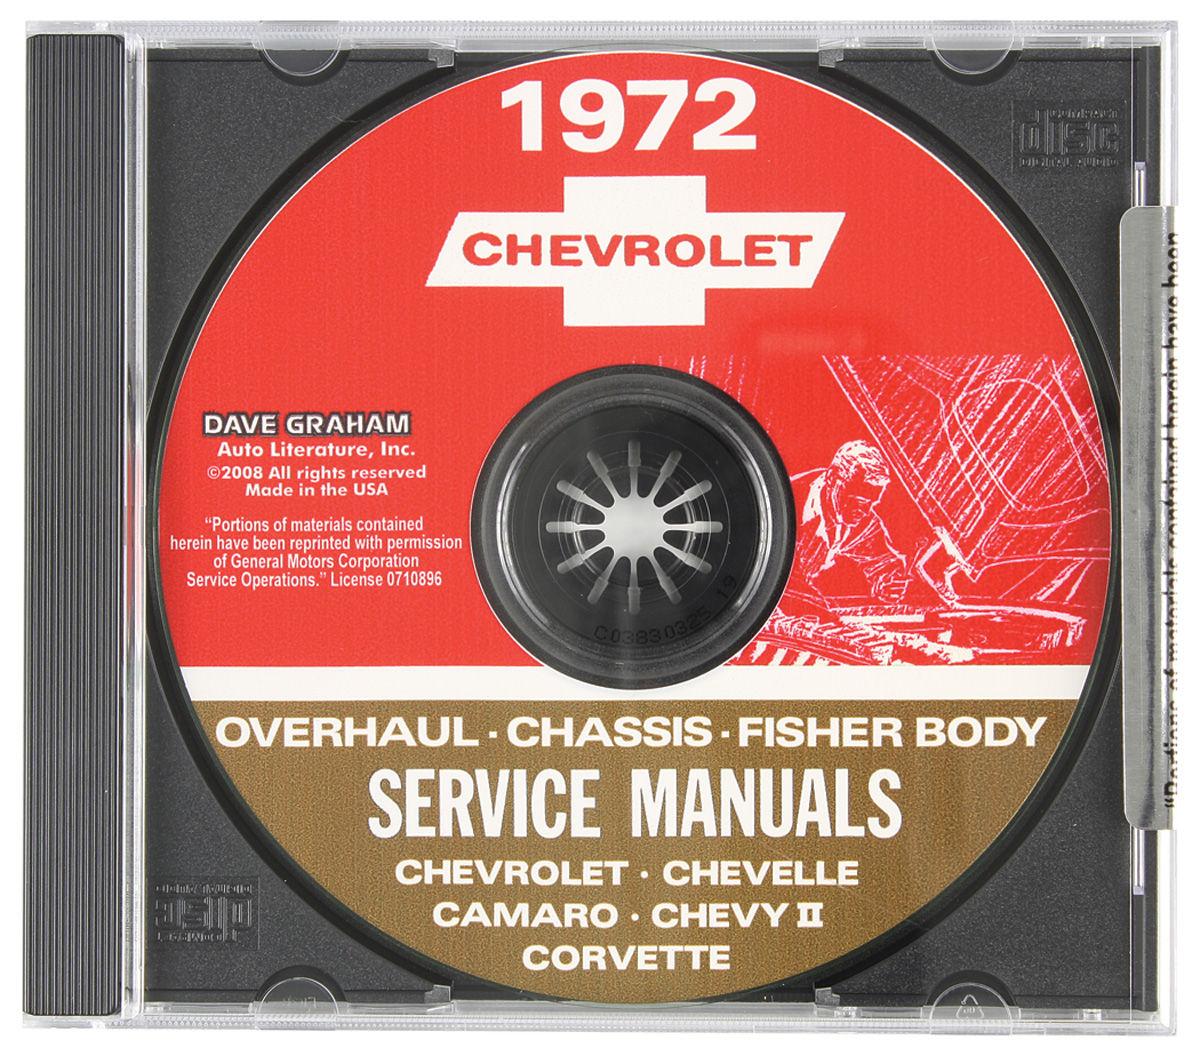 Factory Shop Manuals, CD-ROM, 1976 Monte Carlo